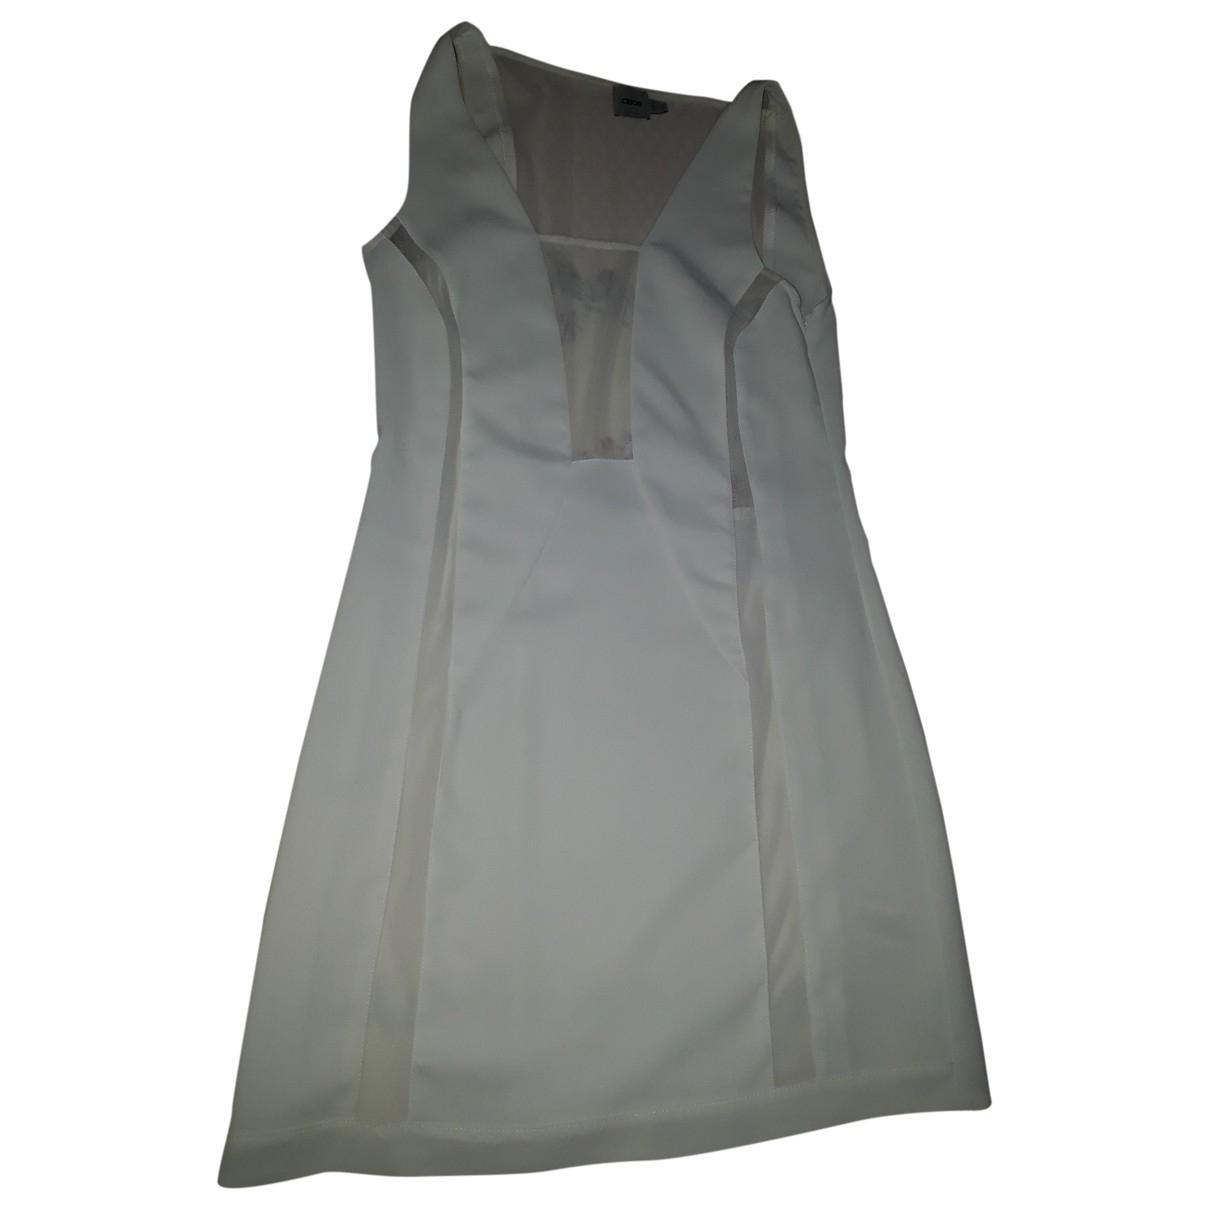 Asos - Robe   pour femme en coton - elasthane - beige